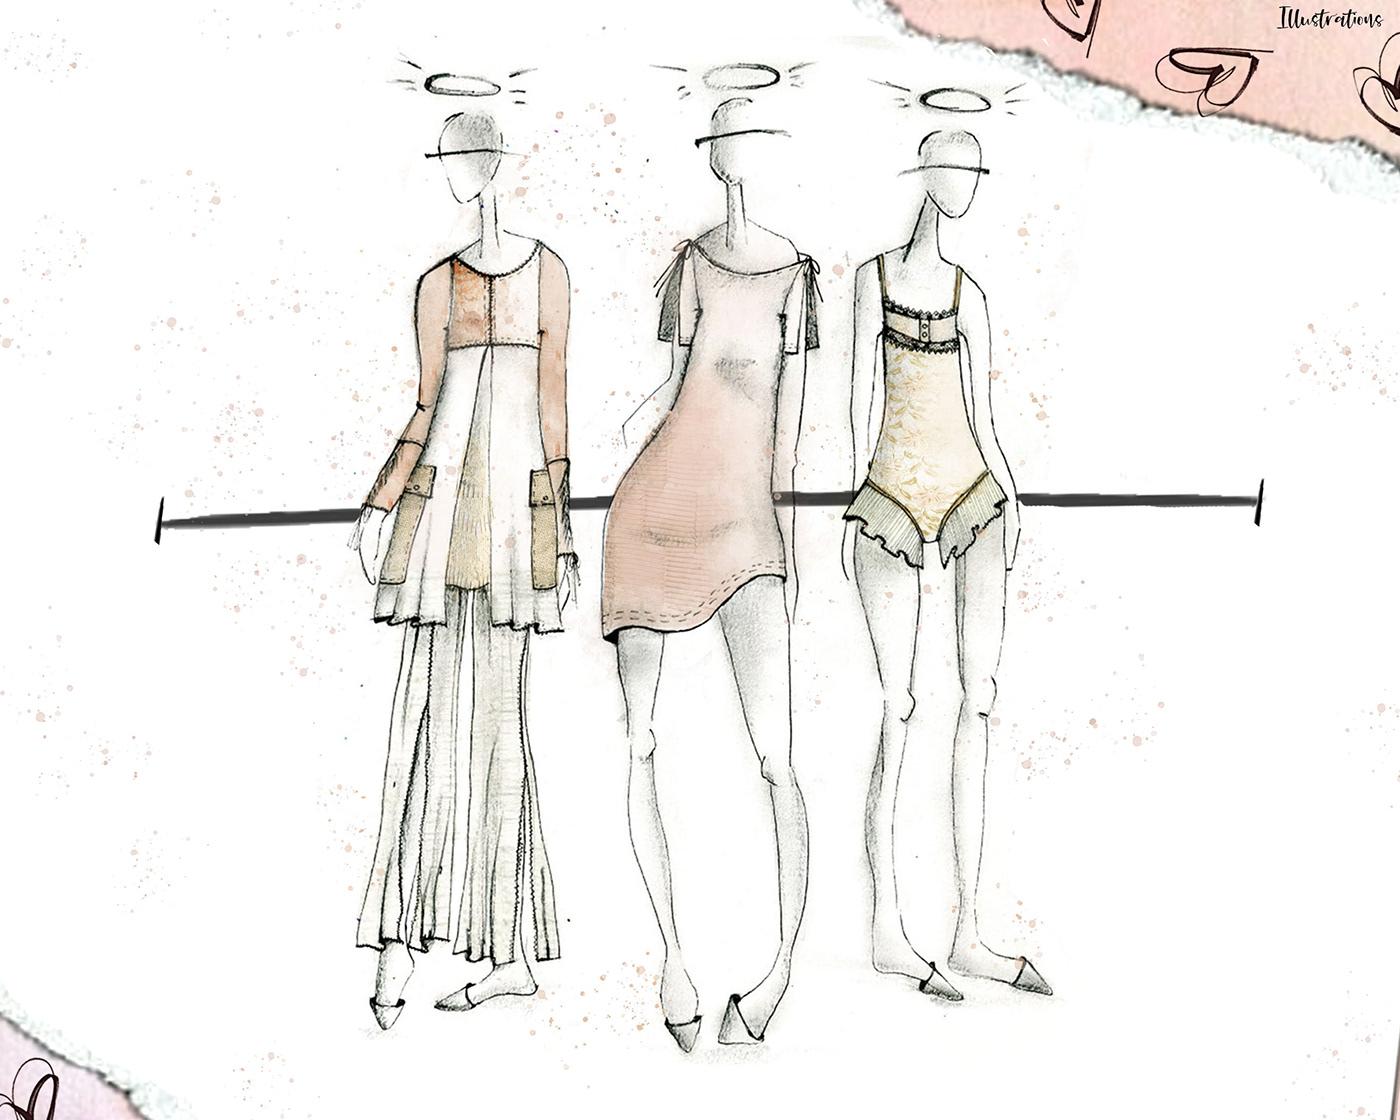 adaptive apparel adobe illustrator Adobe Photoshop fashion design fashion illustration hand rendering intimates lounge Scholarship project technical flats